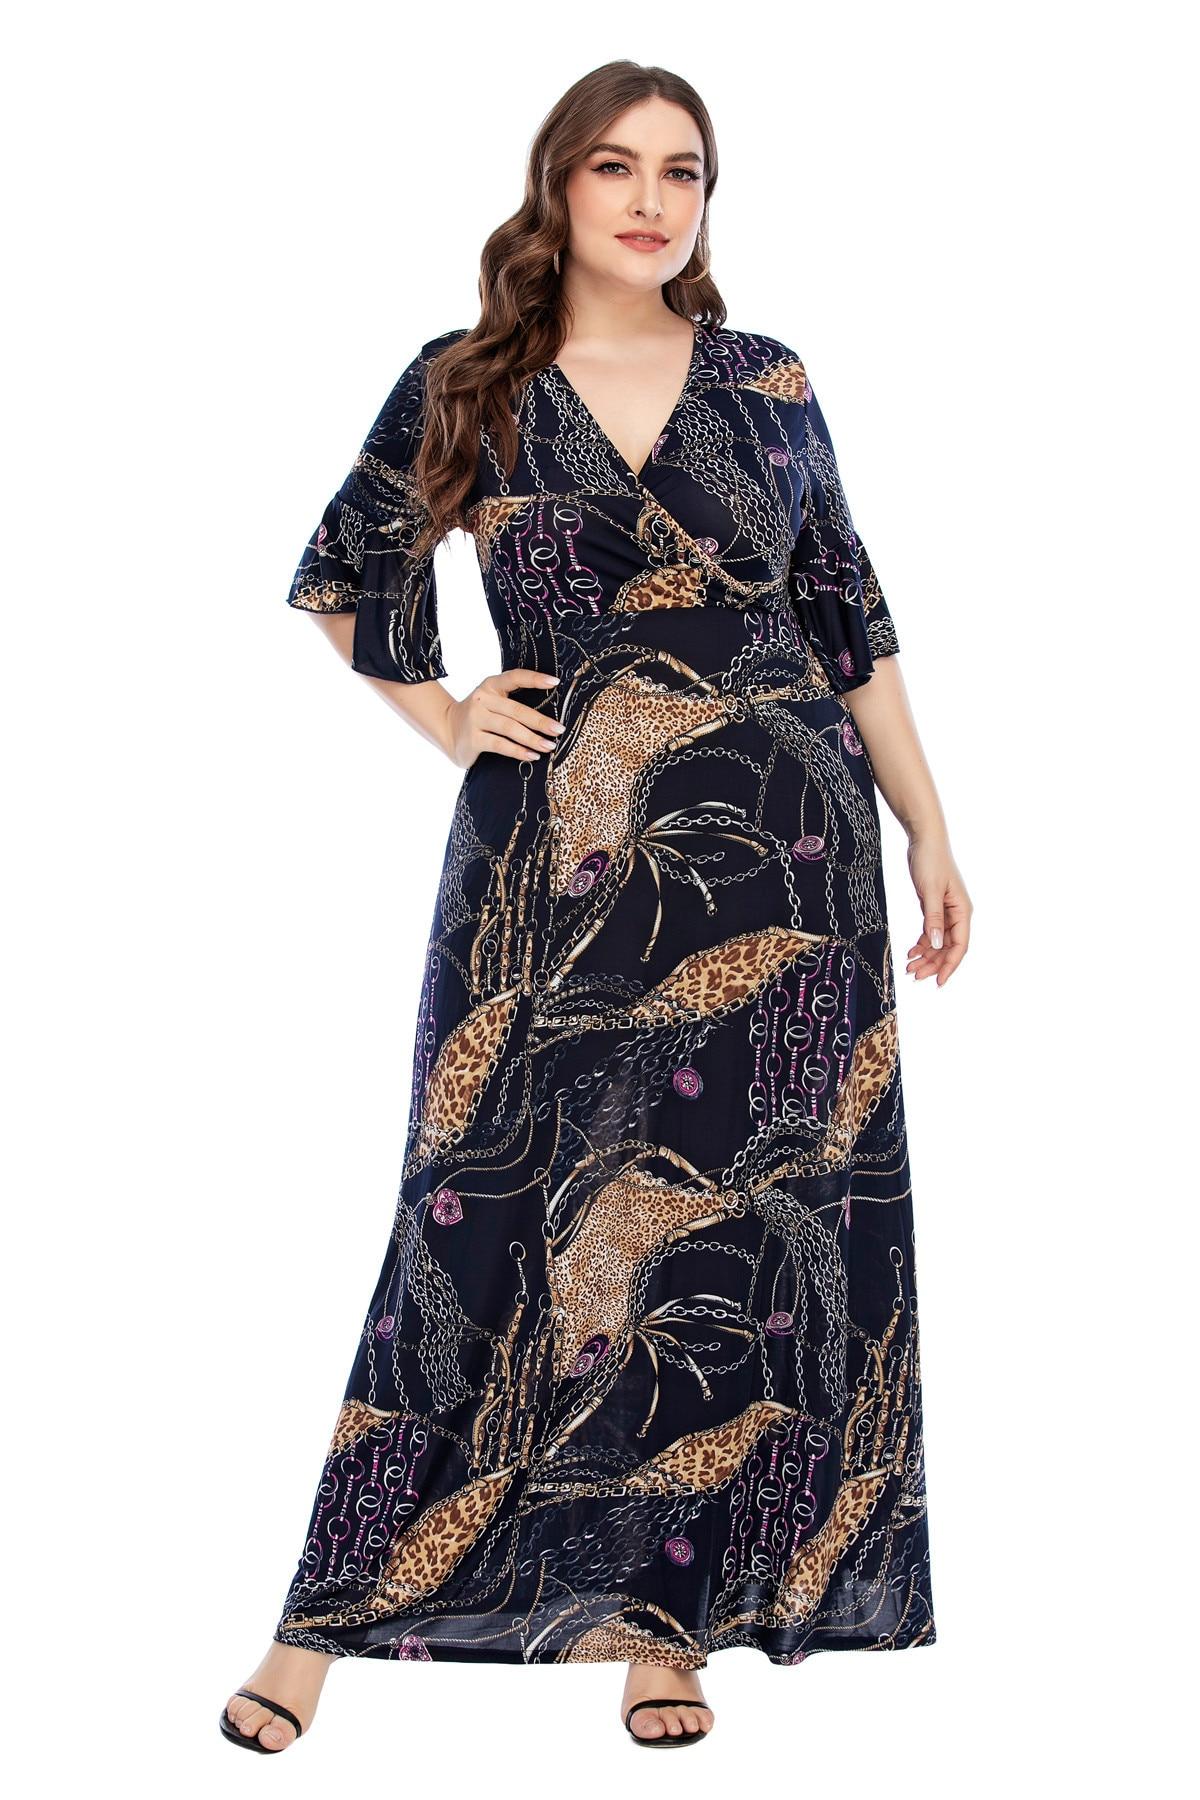 Ramadan Turkey India Muslim Dress Print Maxi Abaya Duabi Arabic Vestidos Moroccon Kaftan Islamic Clothing Jilbab Gown Robe 2021